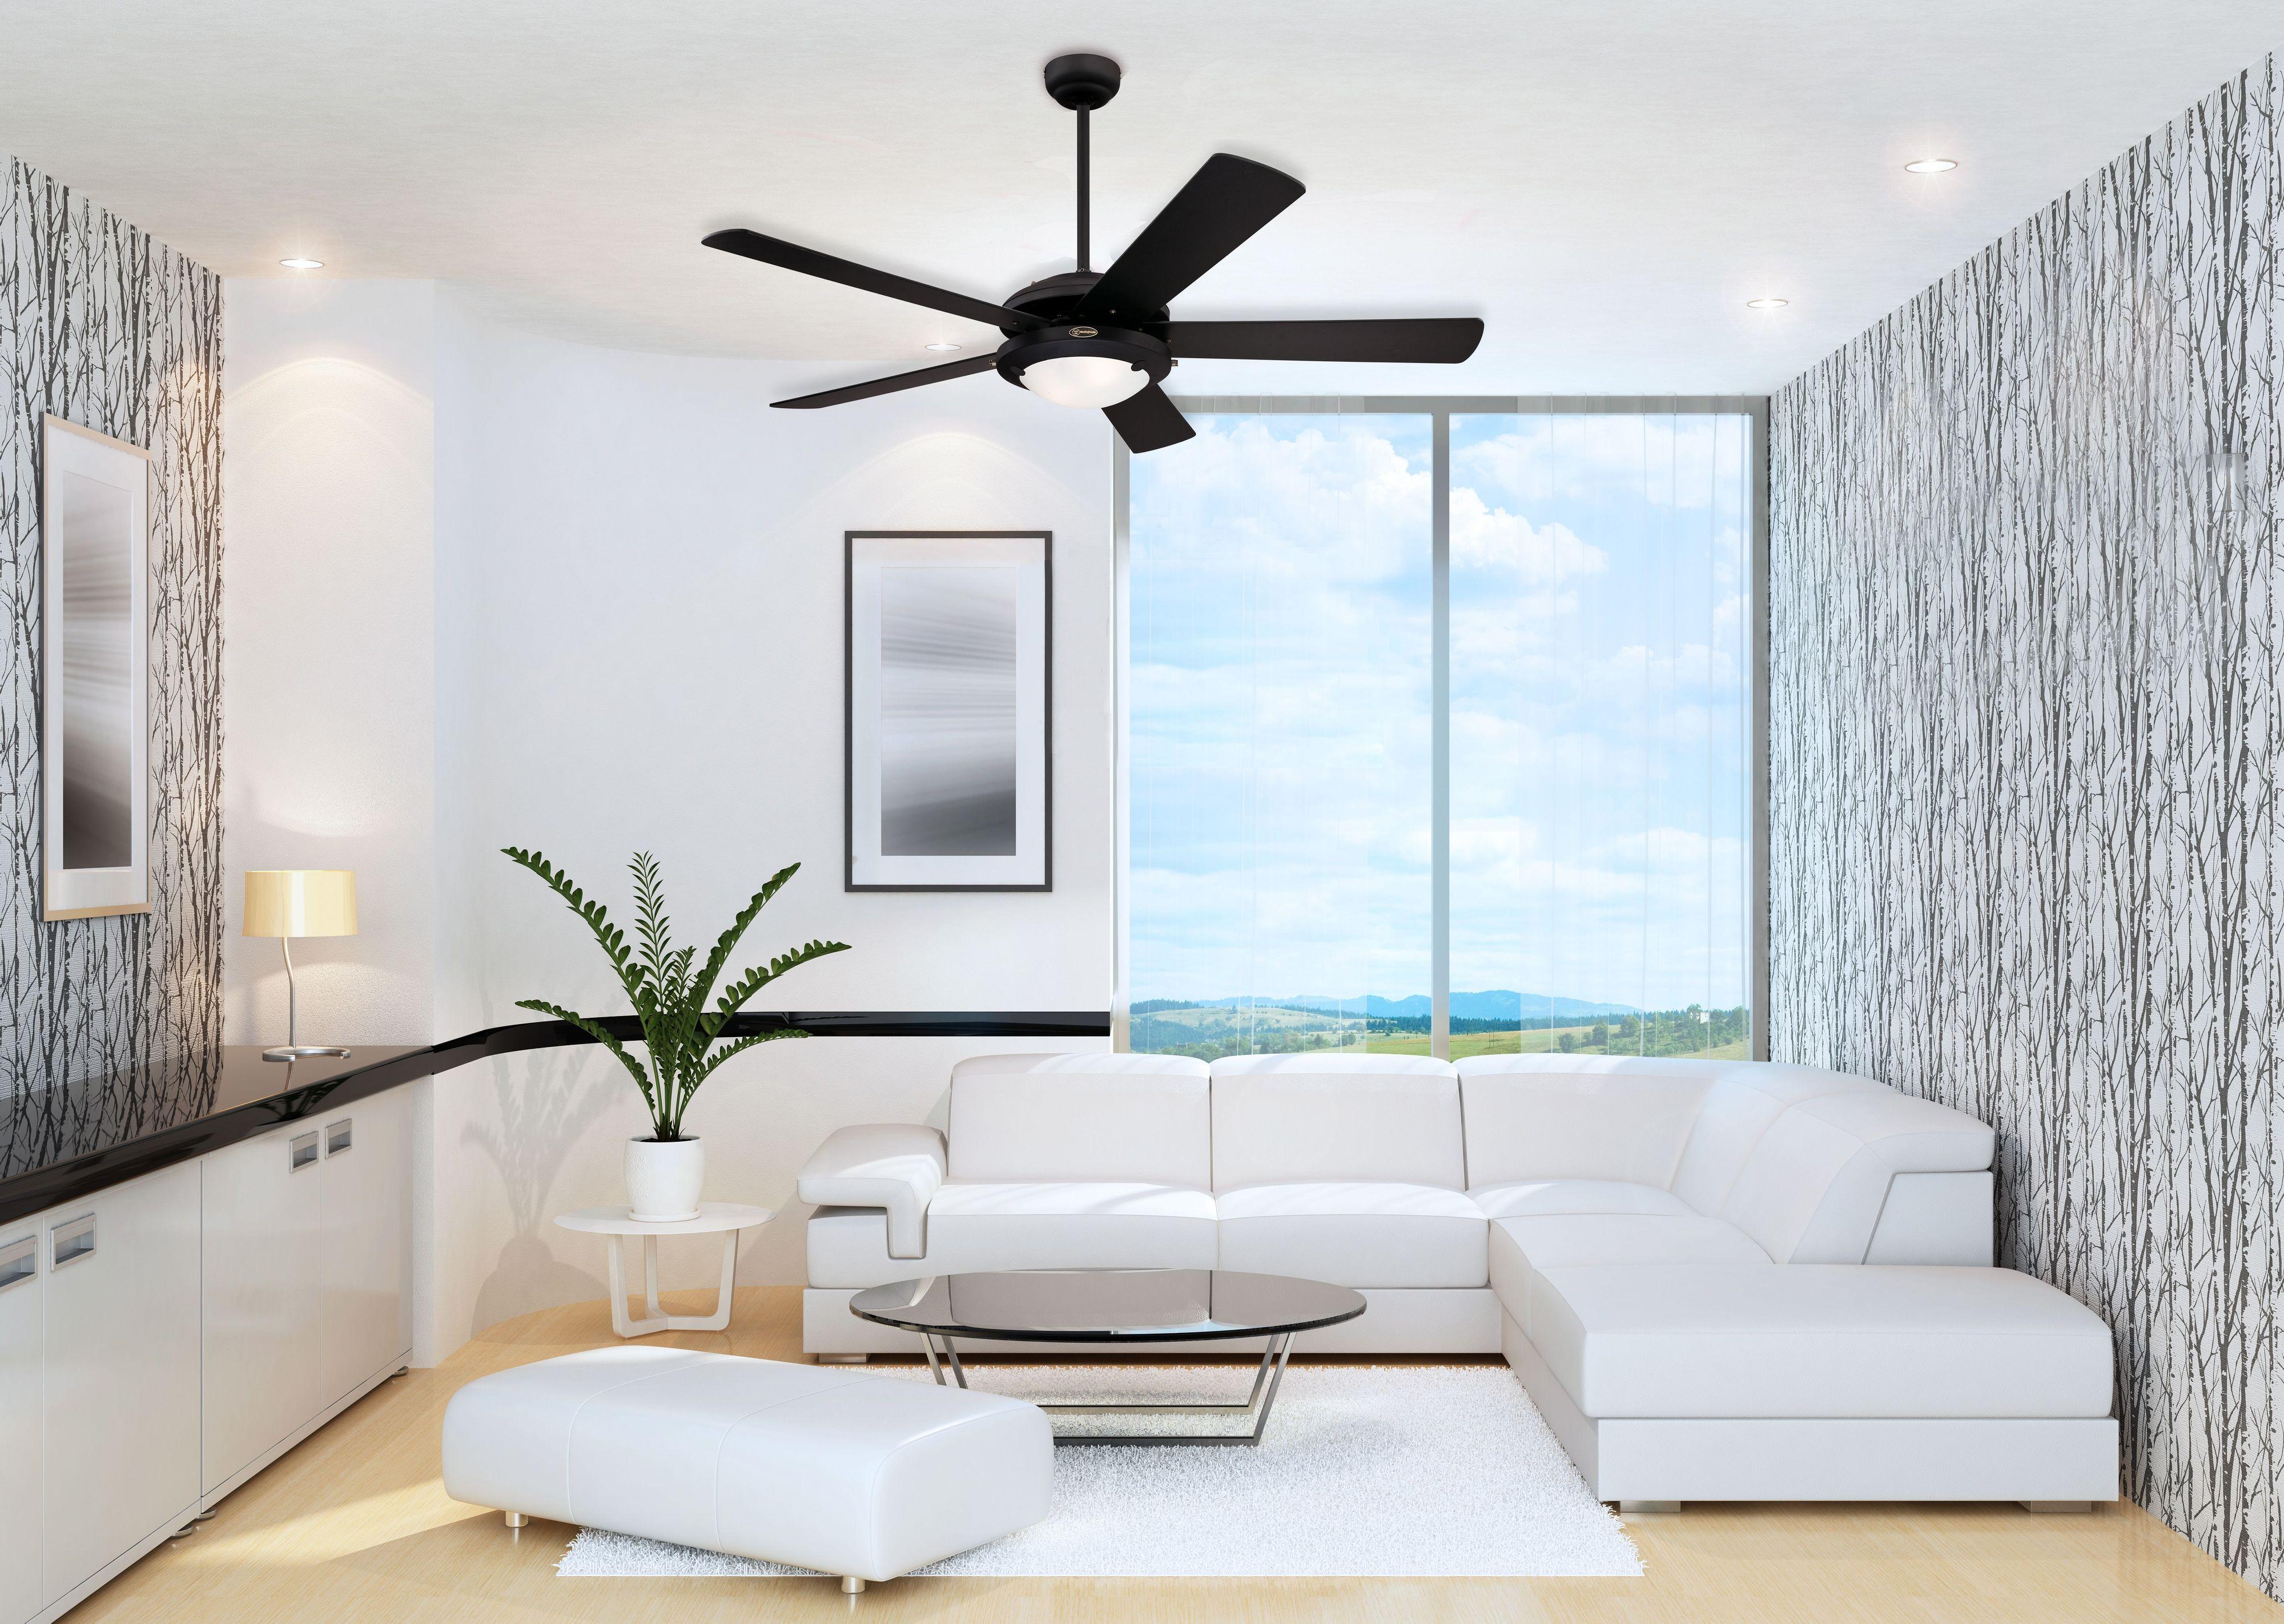 deckenventilator comet schwarz mit beleuchtung 132 cm. Black Bedroom Furniture Sets. Home Design Ideas